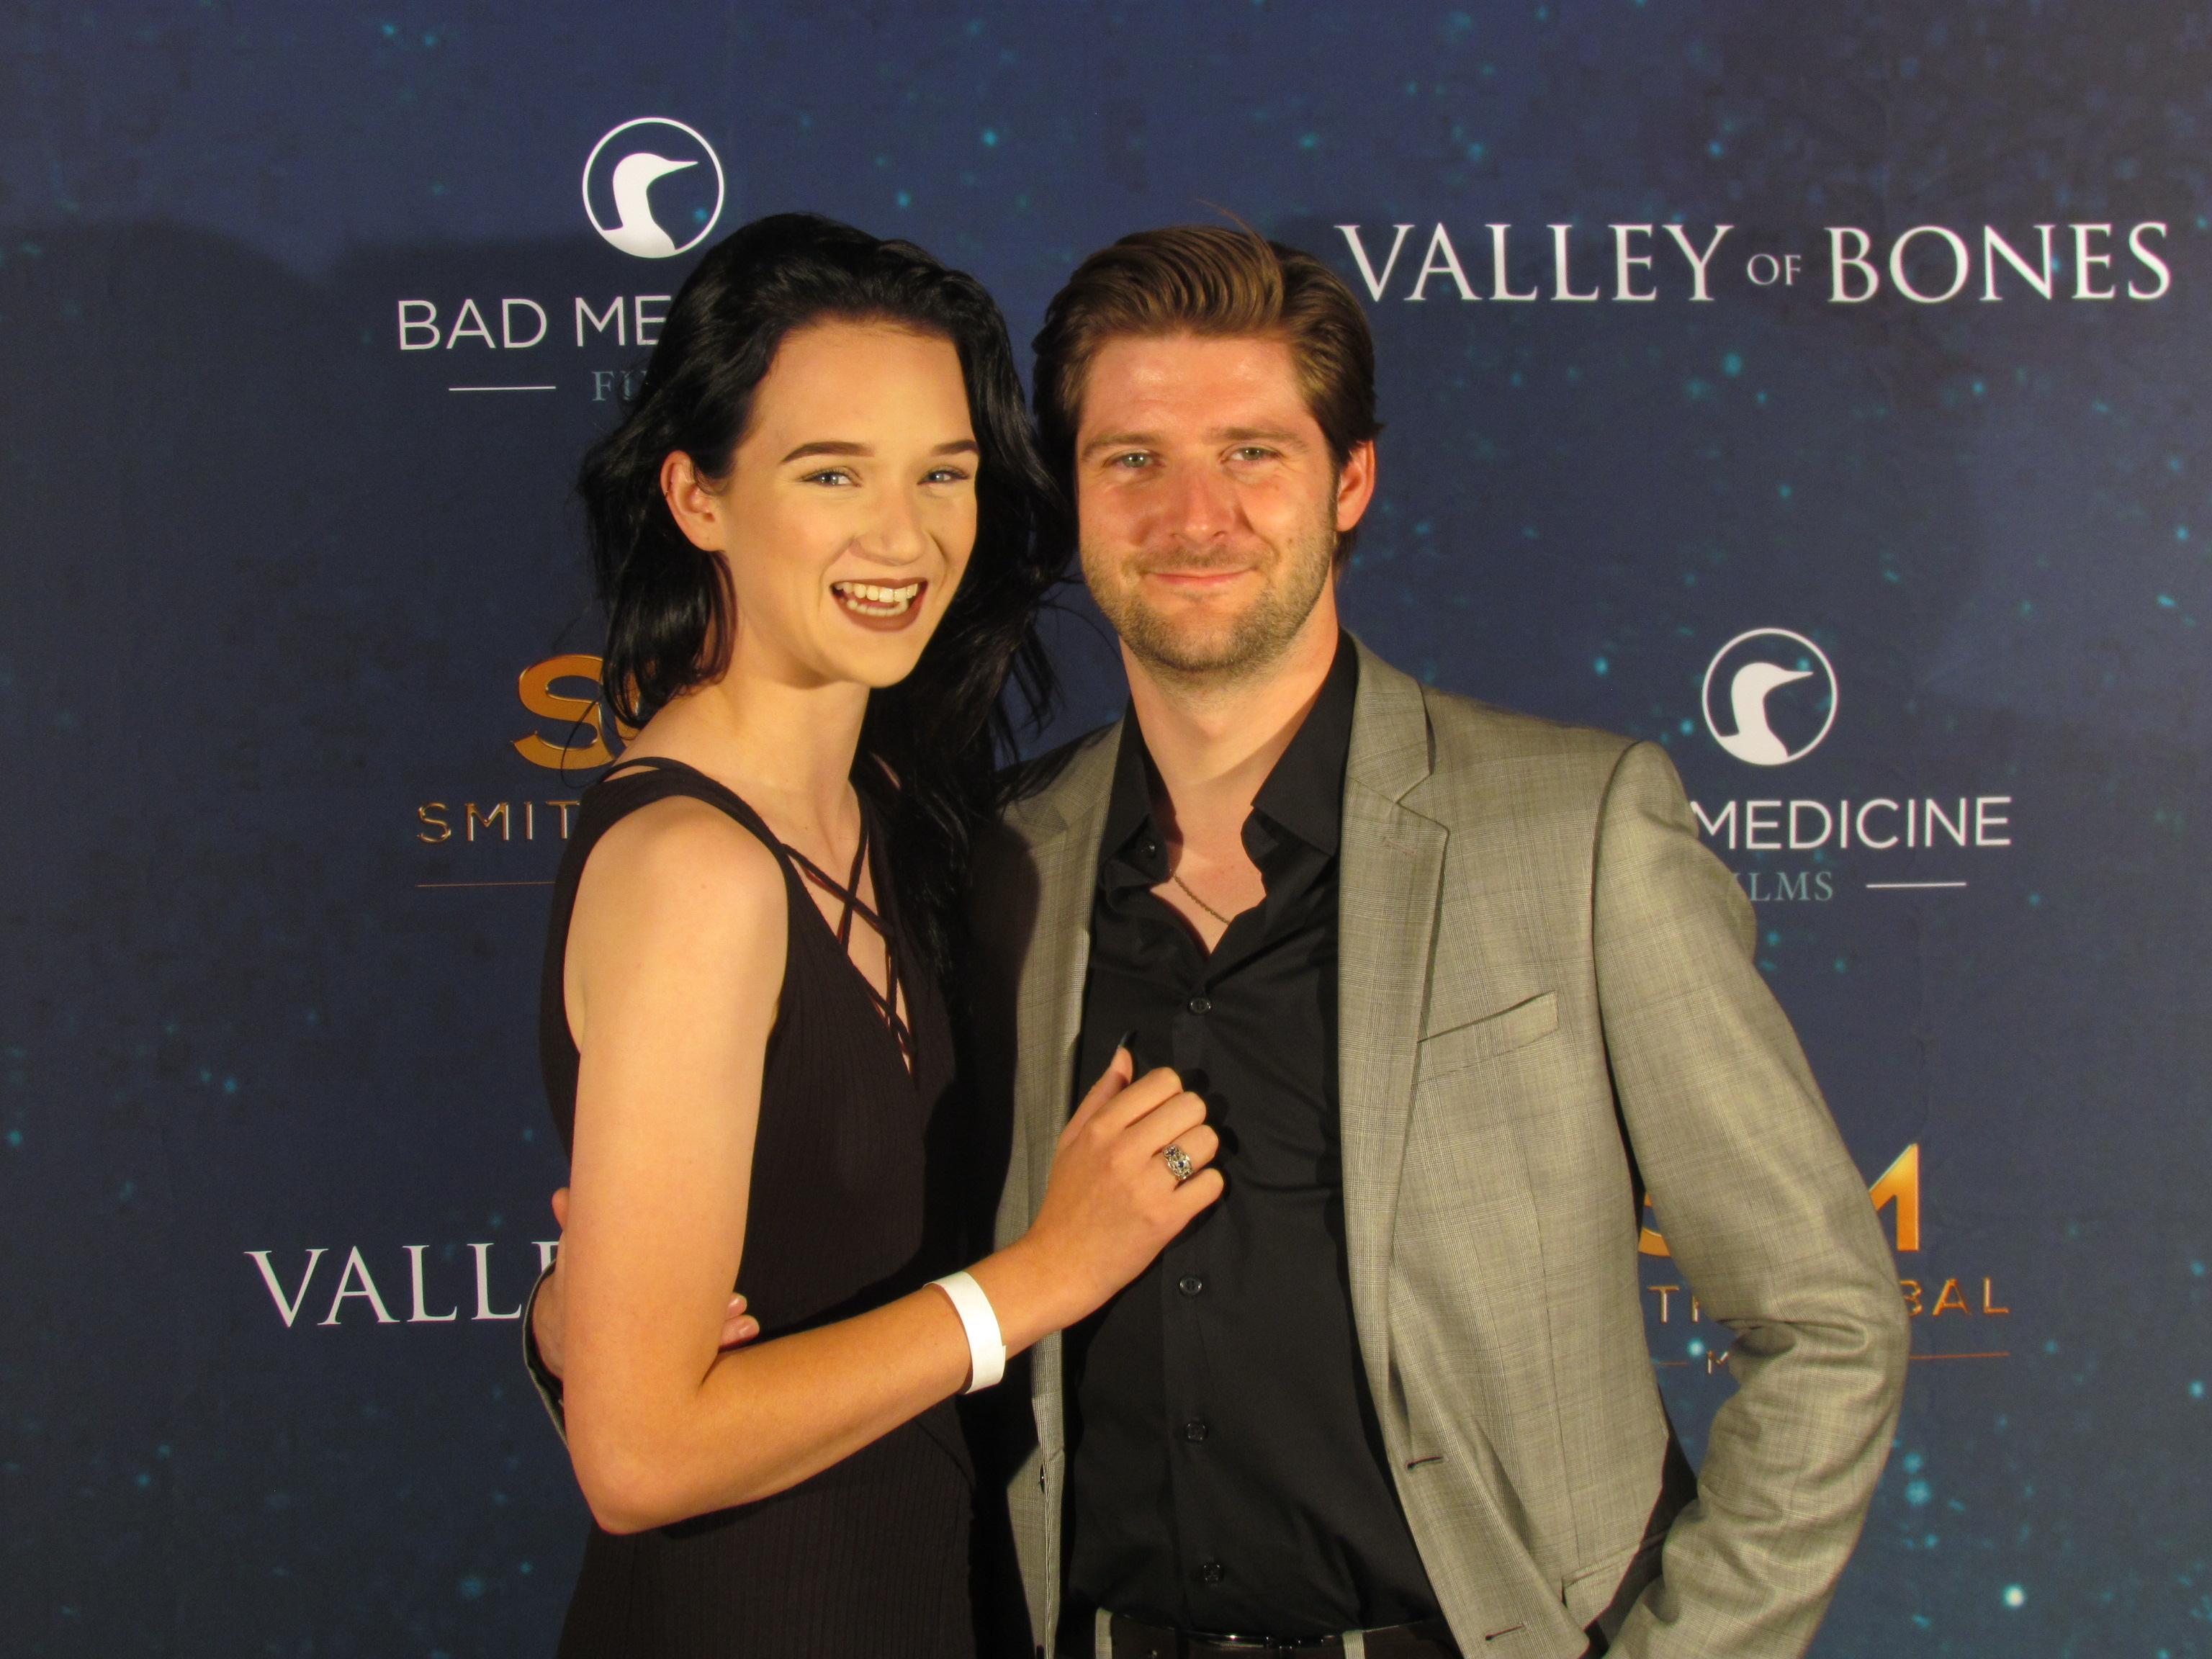 Valley of Bones Fargo Premiere